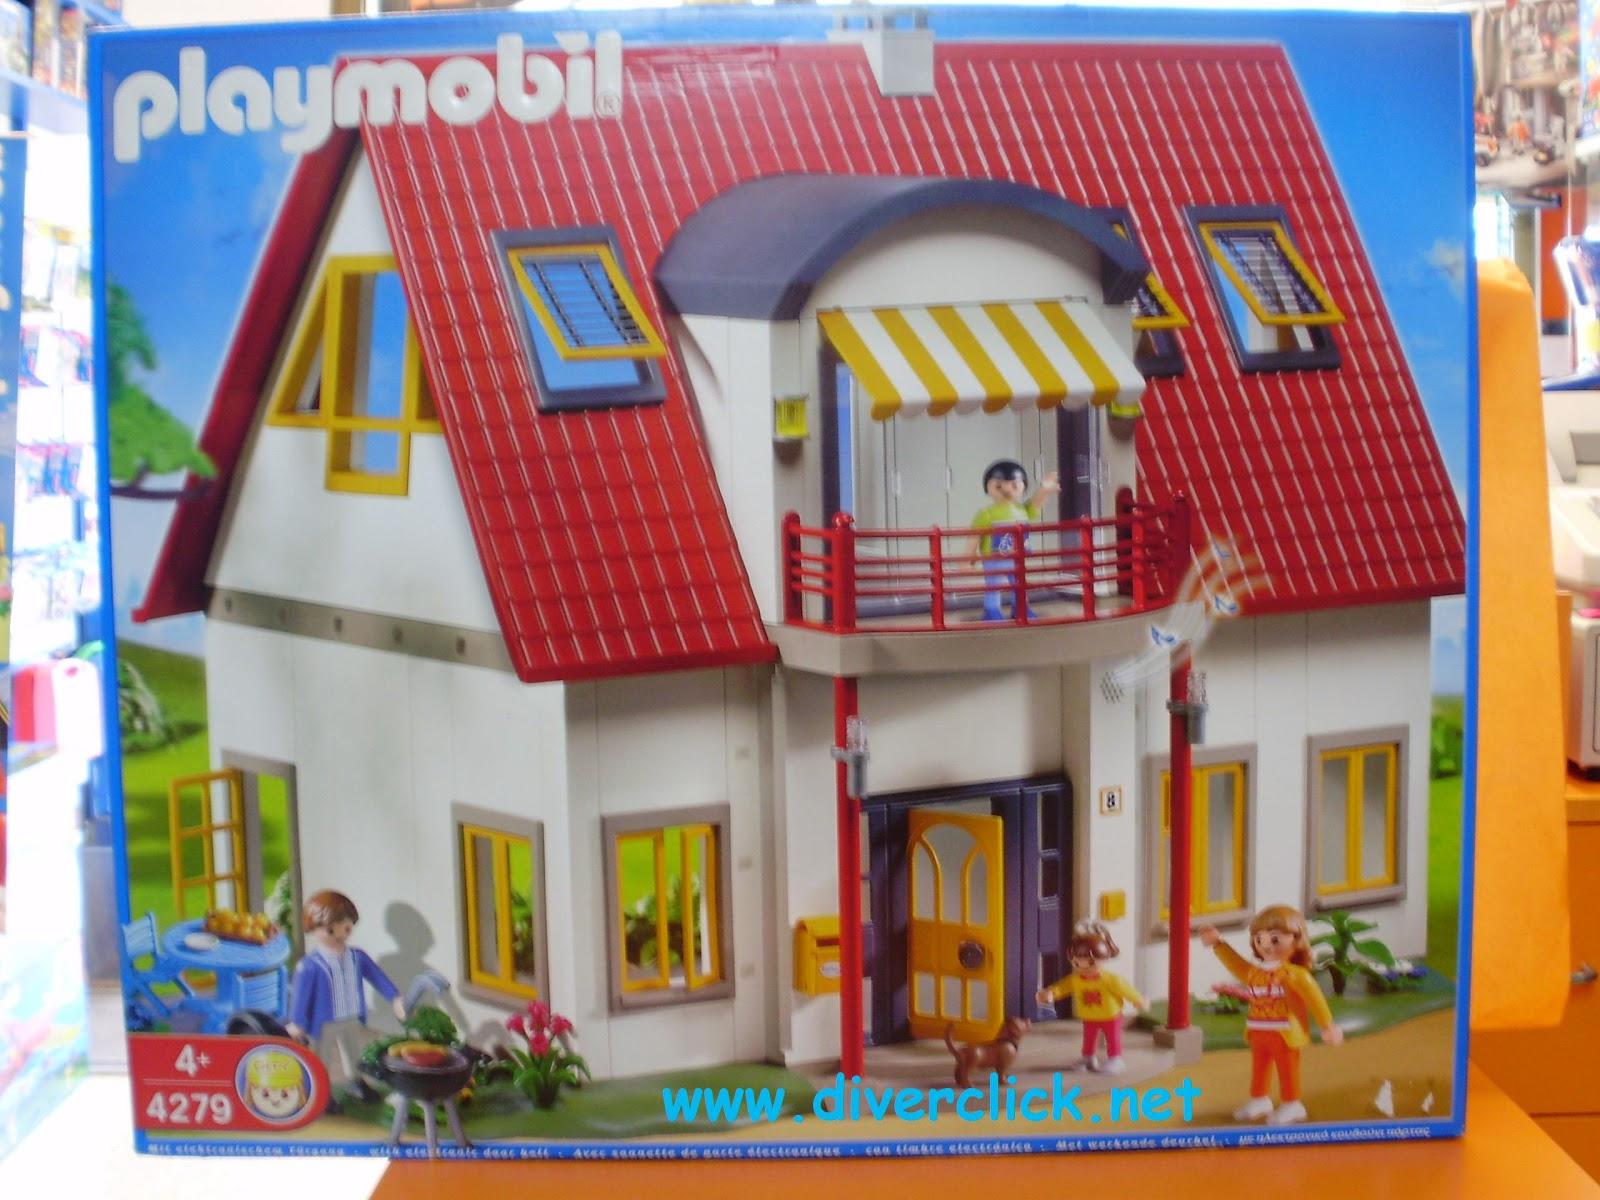 Playmobil barcelona y lego barcelona espa a venta for Casa playmobil precio